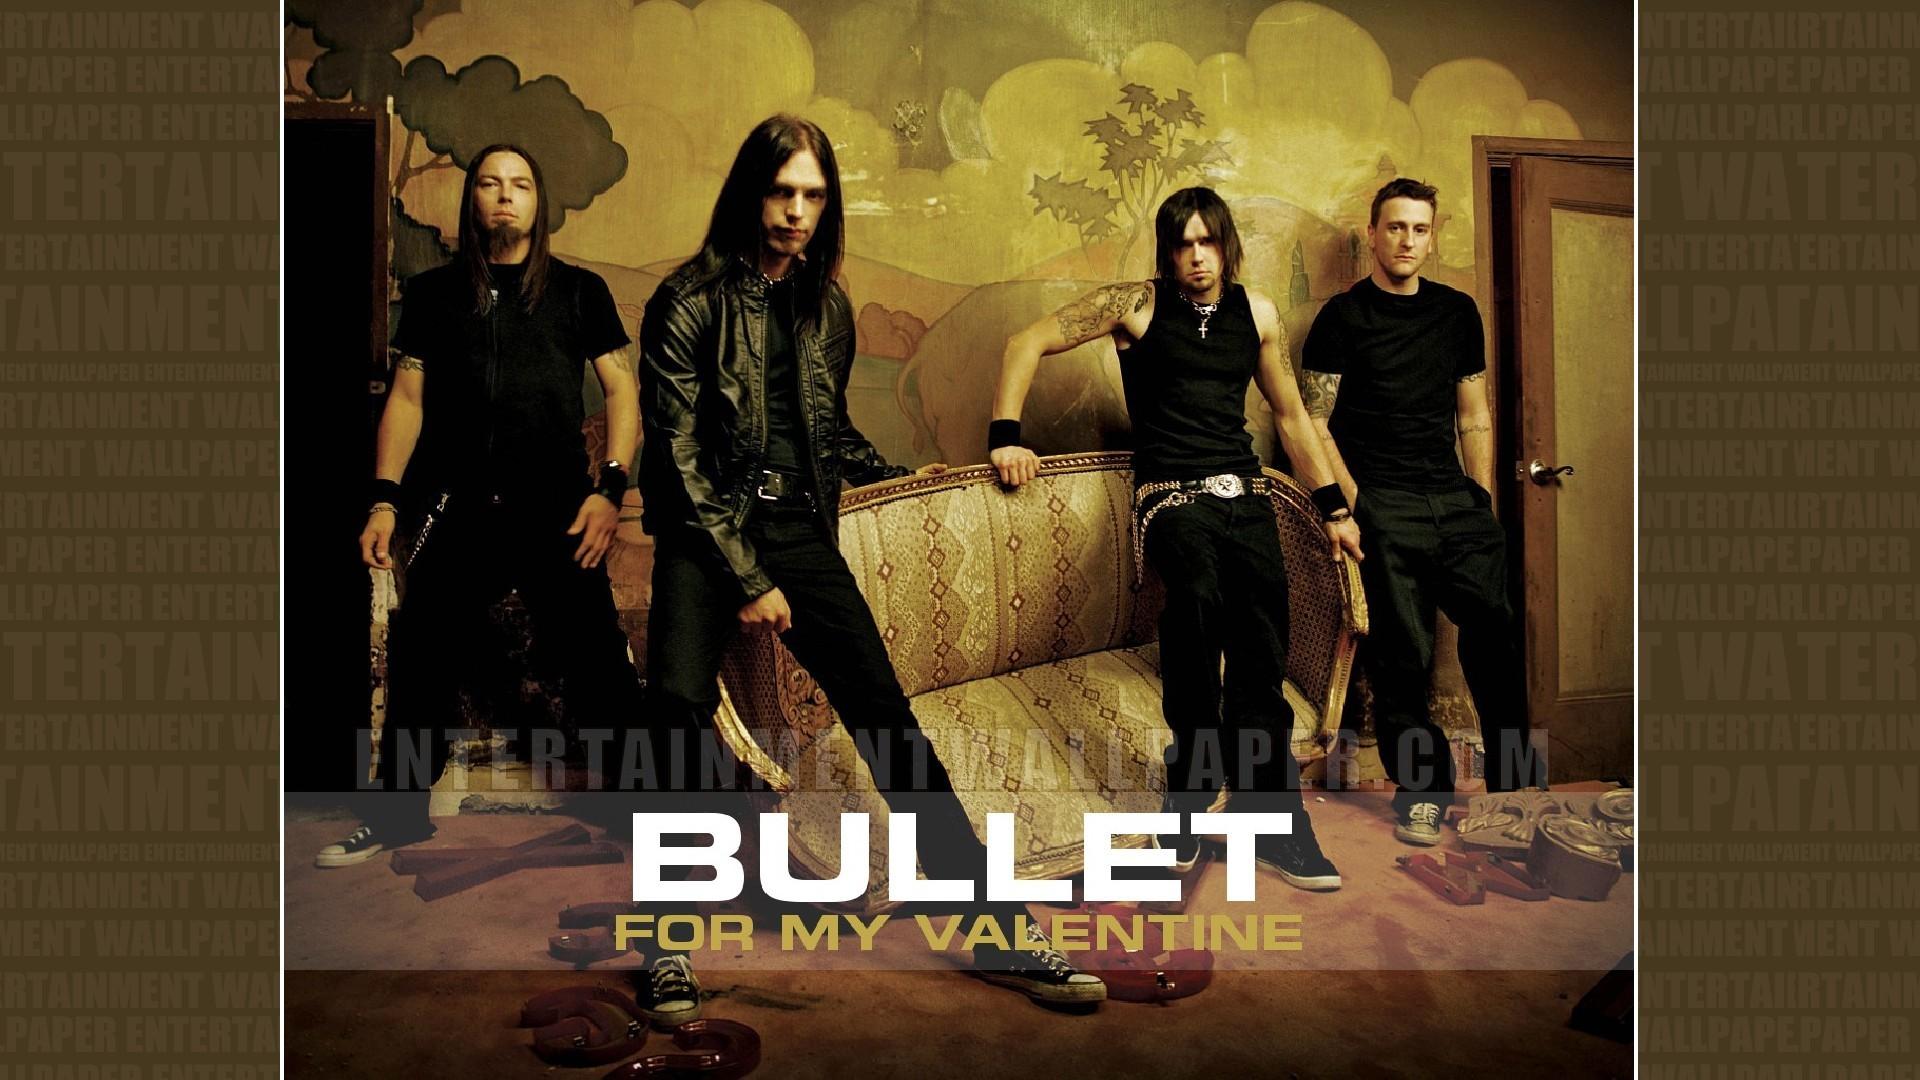 Bullet For My Valentine Wallpaper Hd Bullet For My Valentine Wallpaper 67 Images